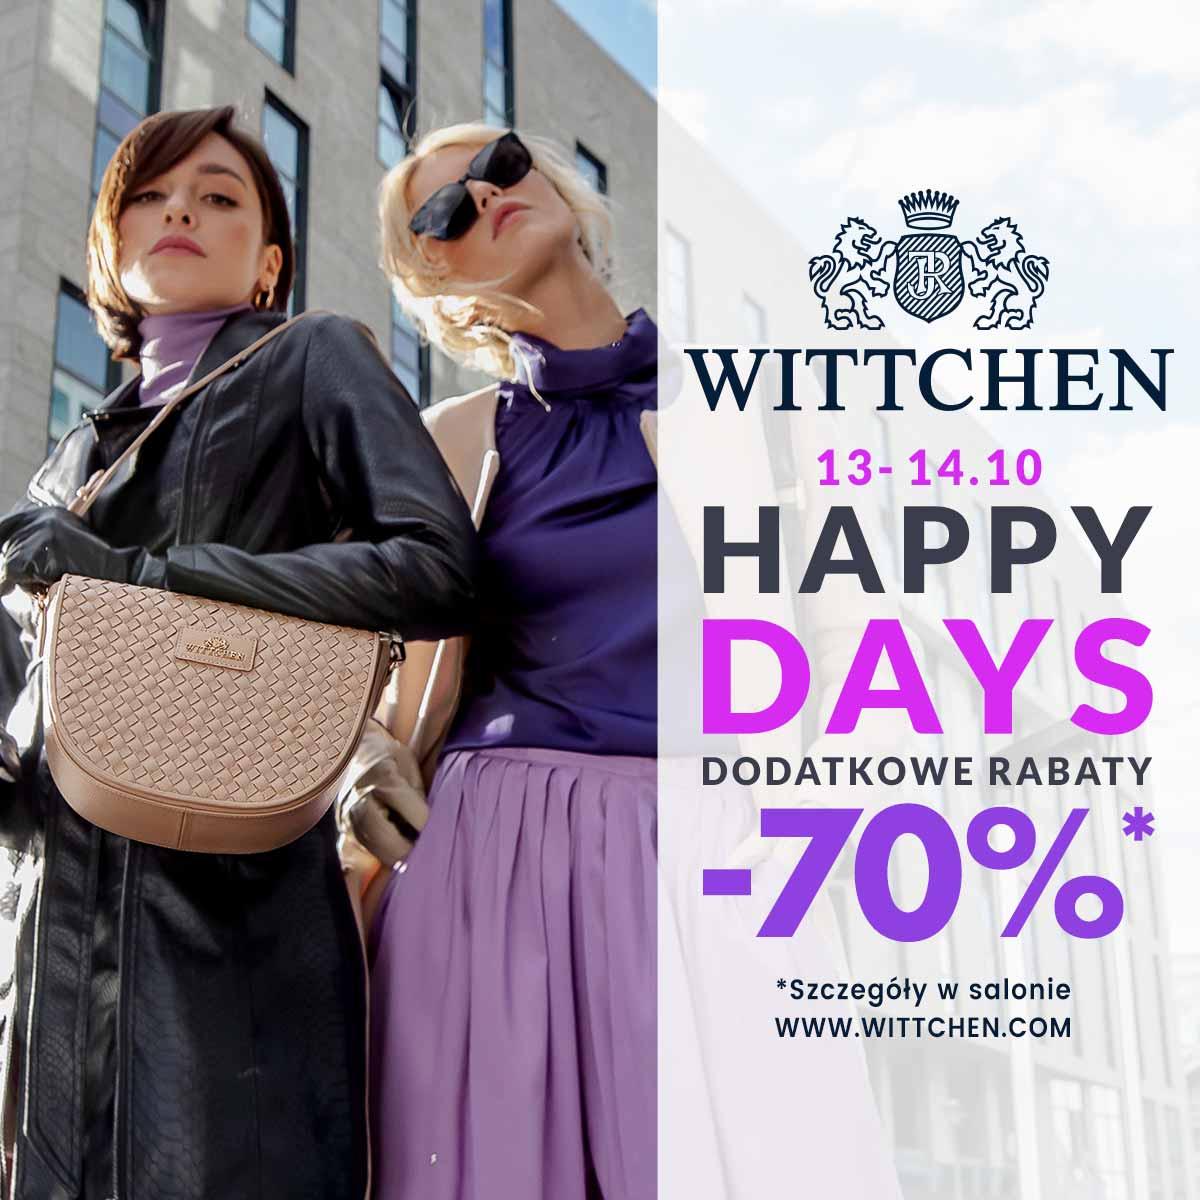 HAPPY DAYS w WITTCHEN!